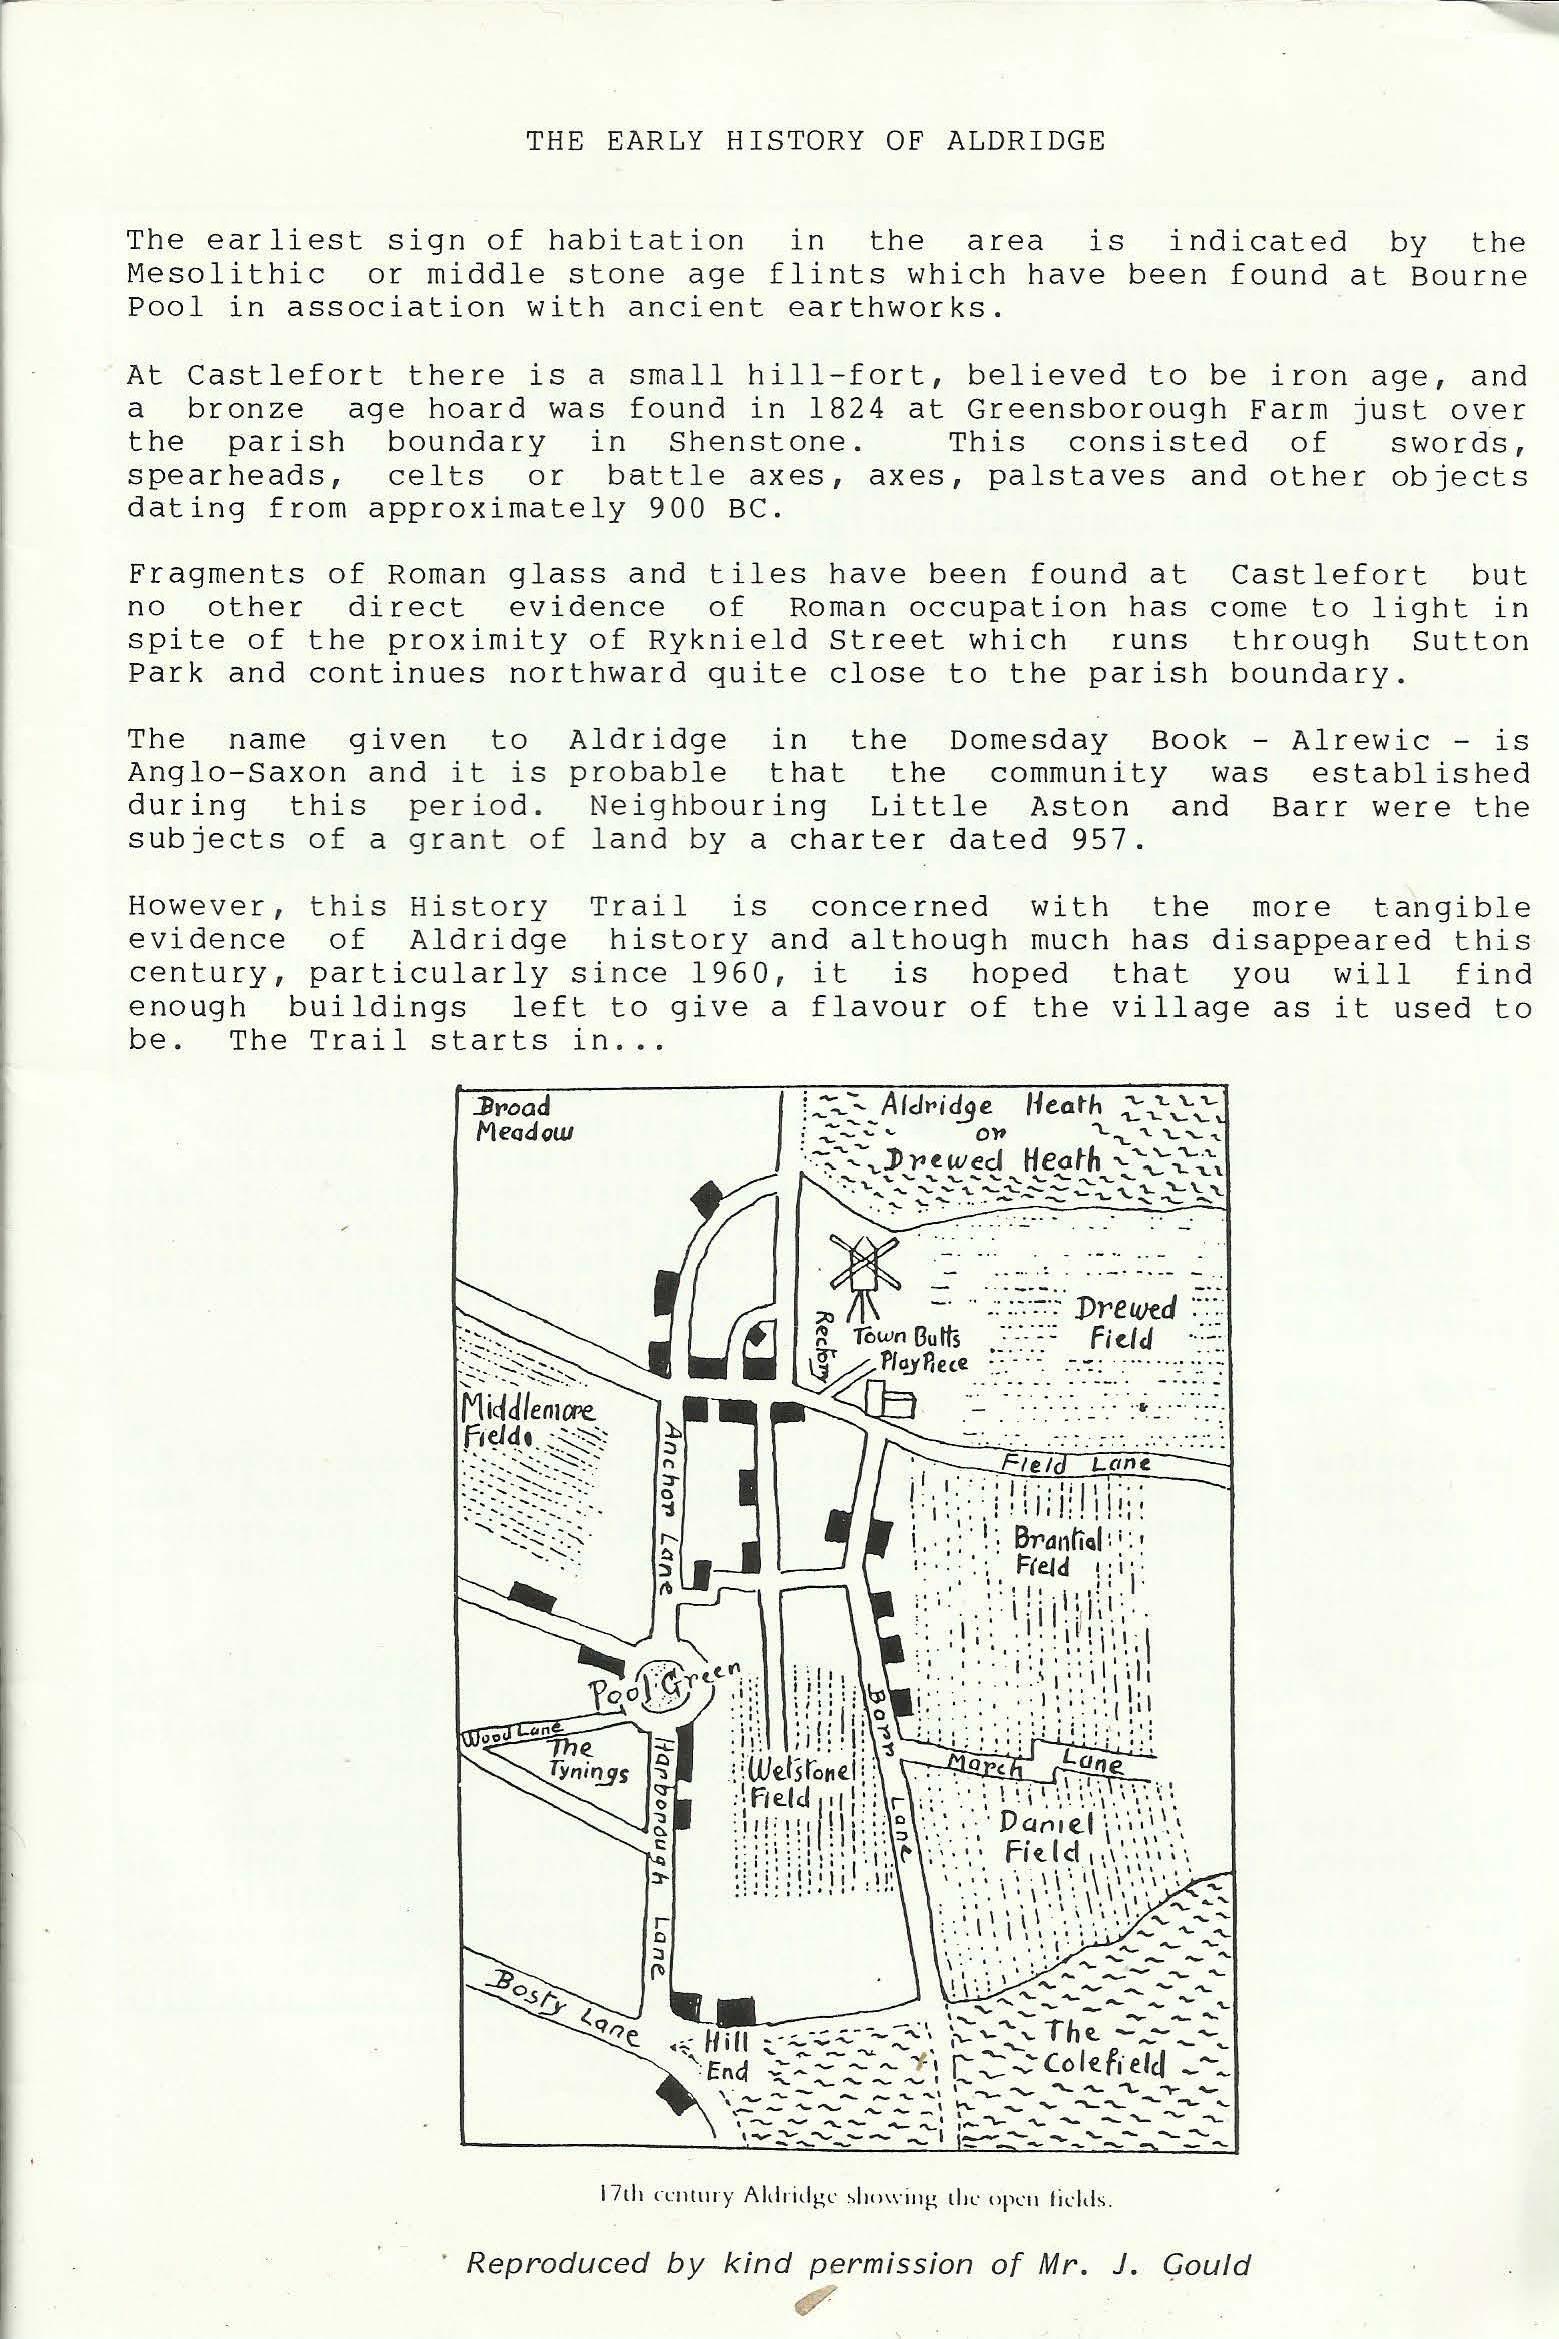 Aldridge History Trail_000004